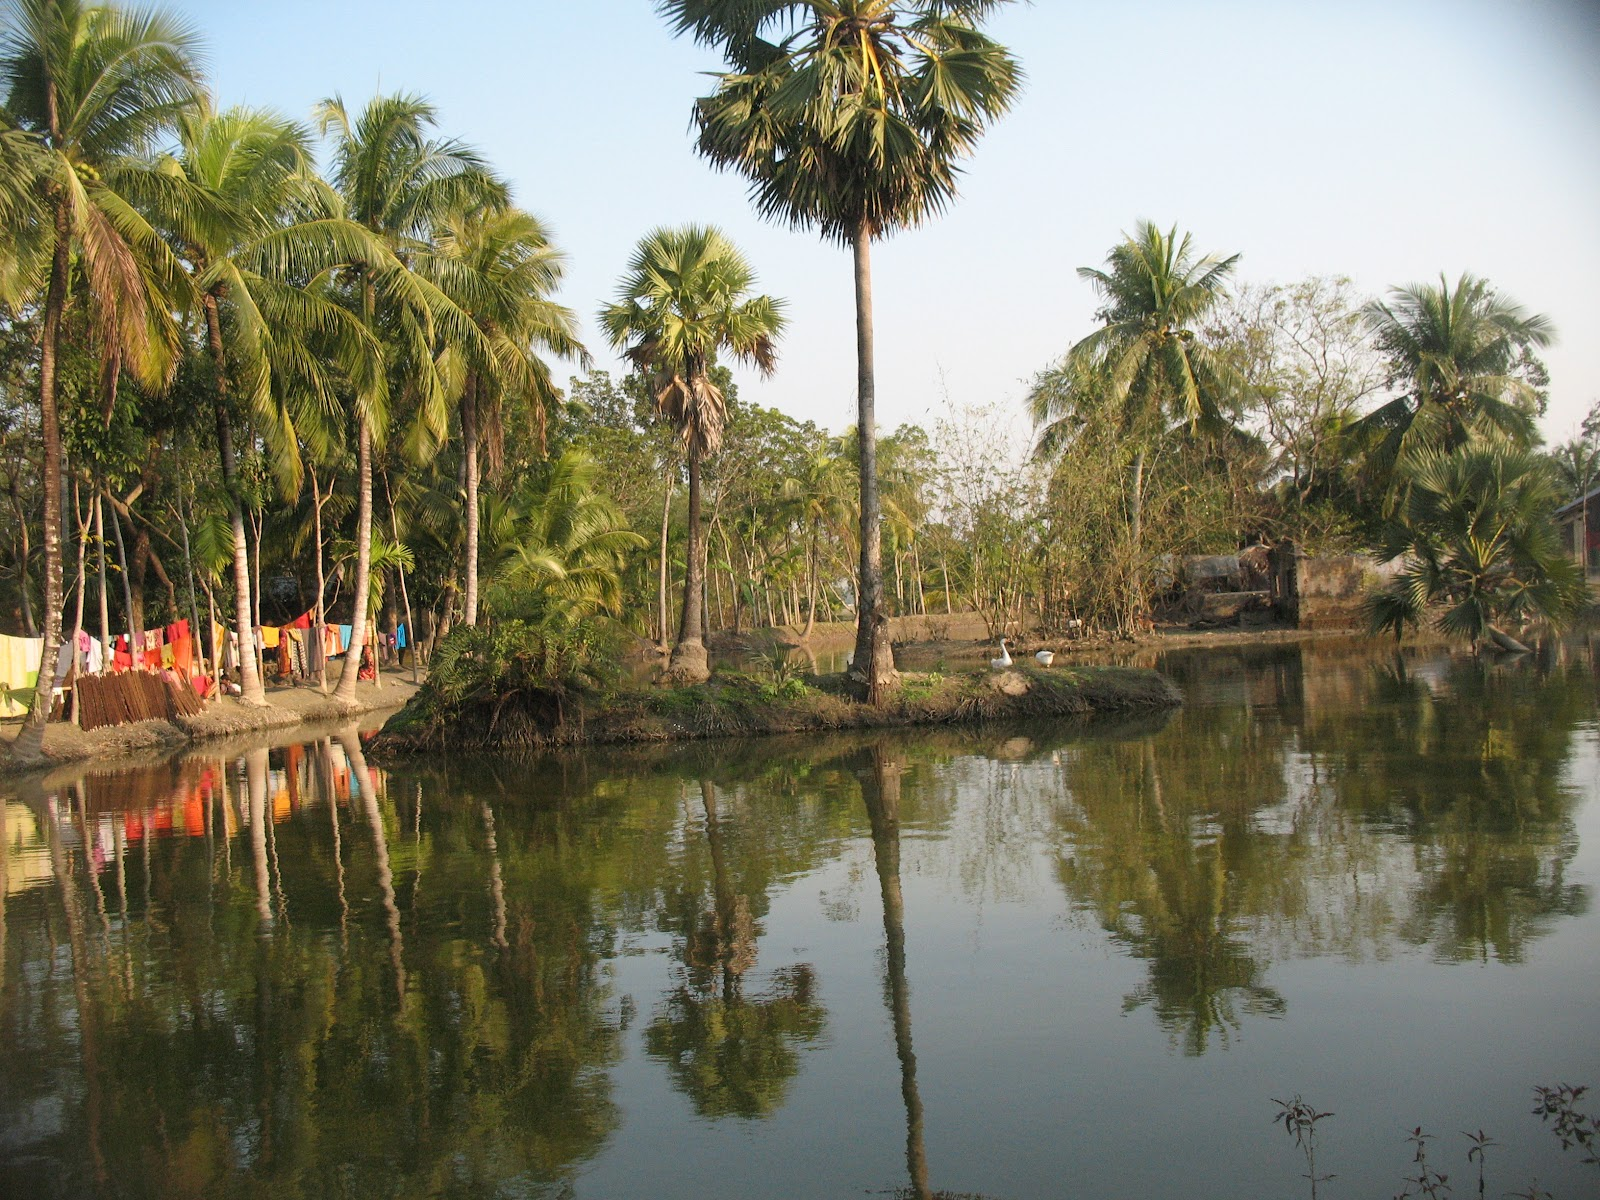 Kevinaldjohnson Bangladesh 2012 Trip Report